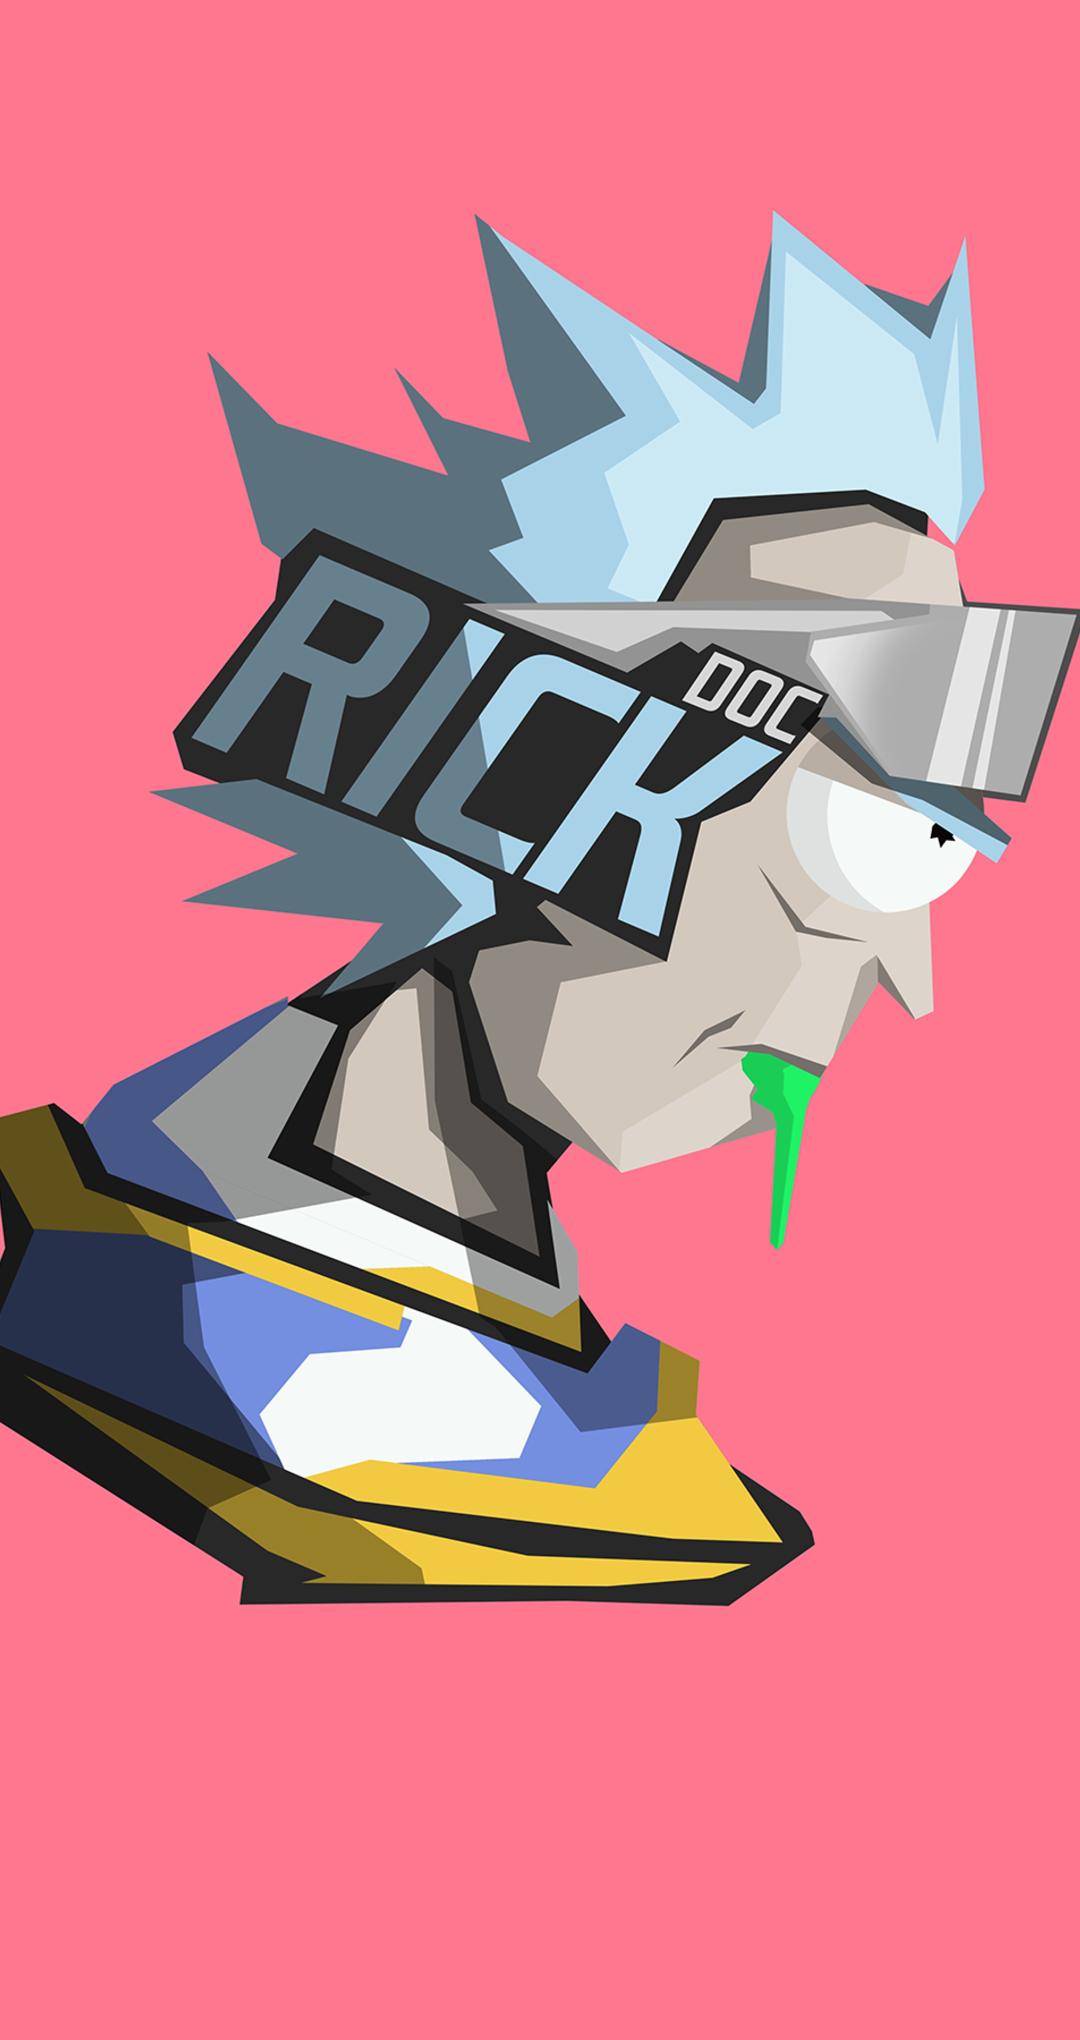 1080x2040 Rick And Morty Headshot Minimal 1080x2040 ...